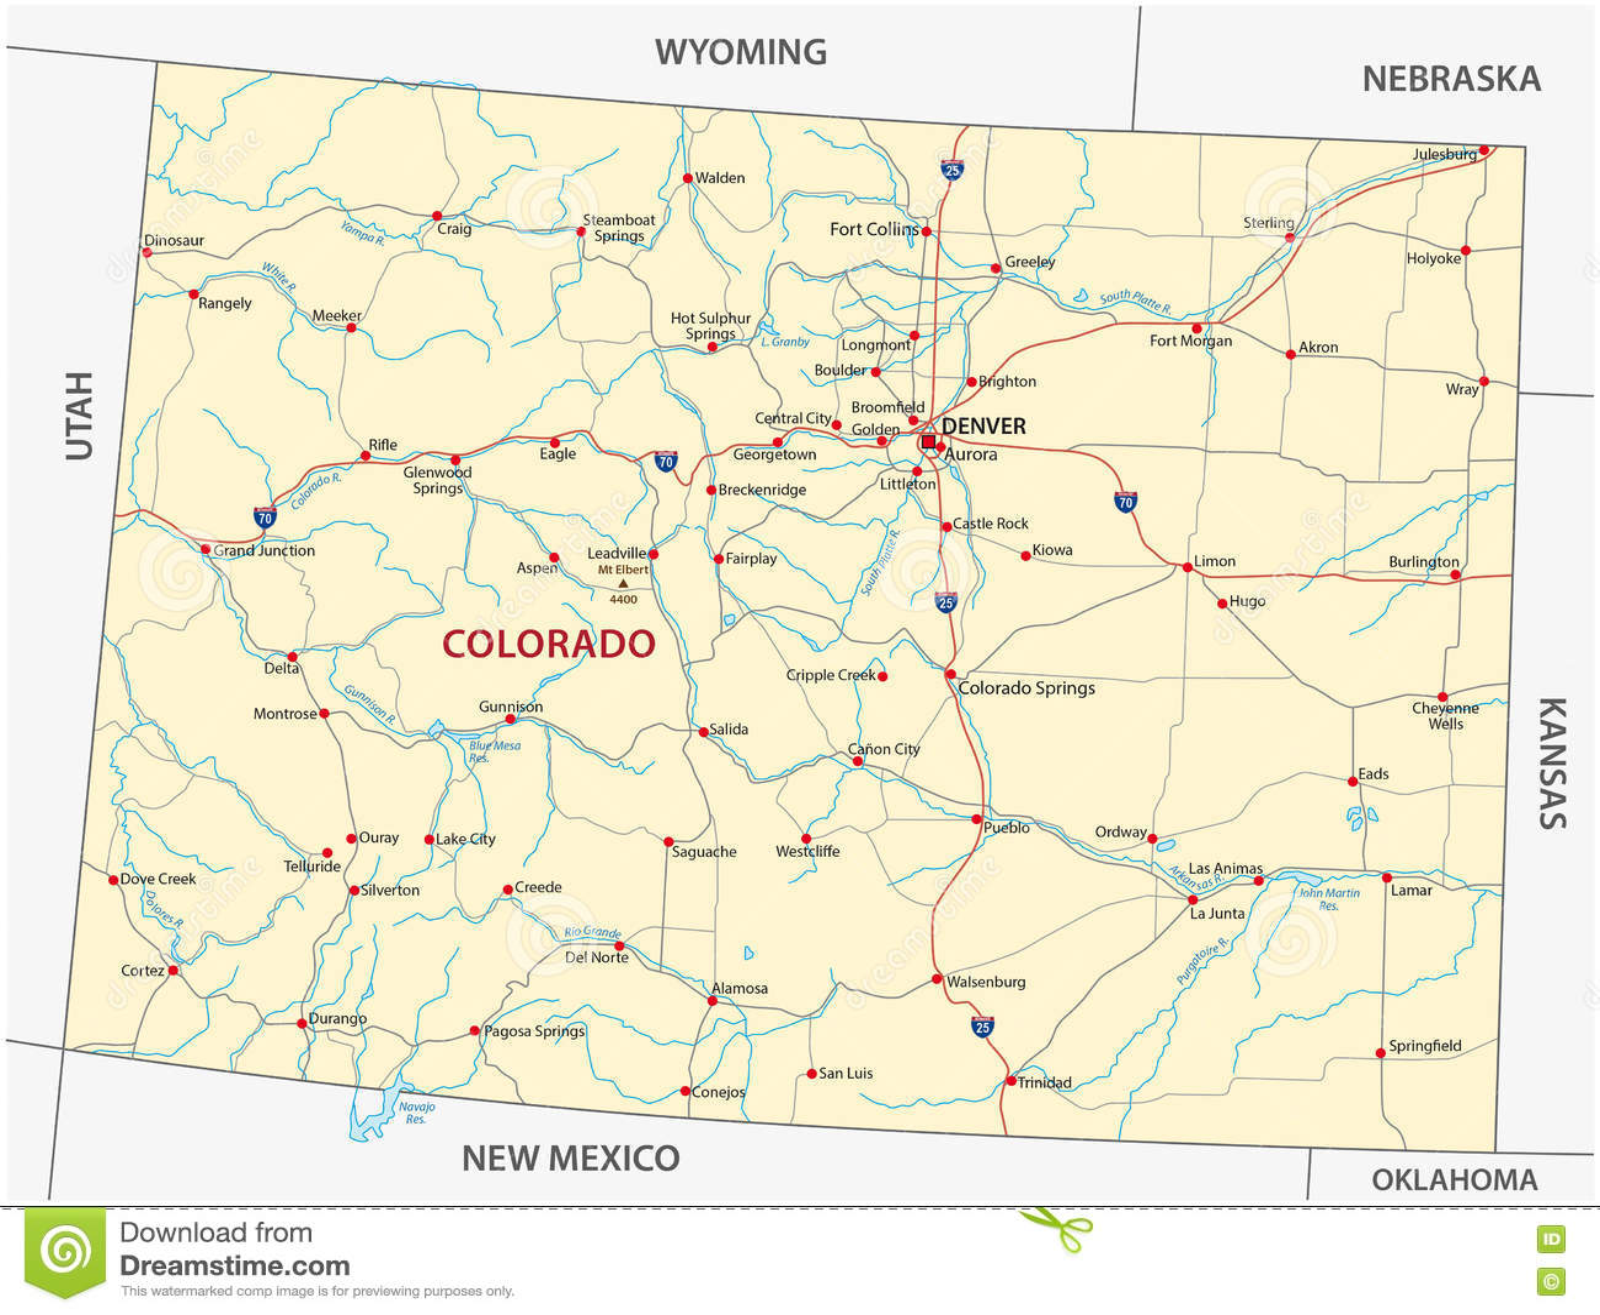 Colorado road map stock vector. Illustration of mexico - 78095663